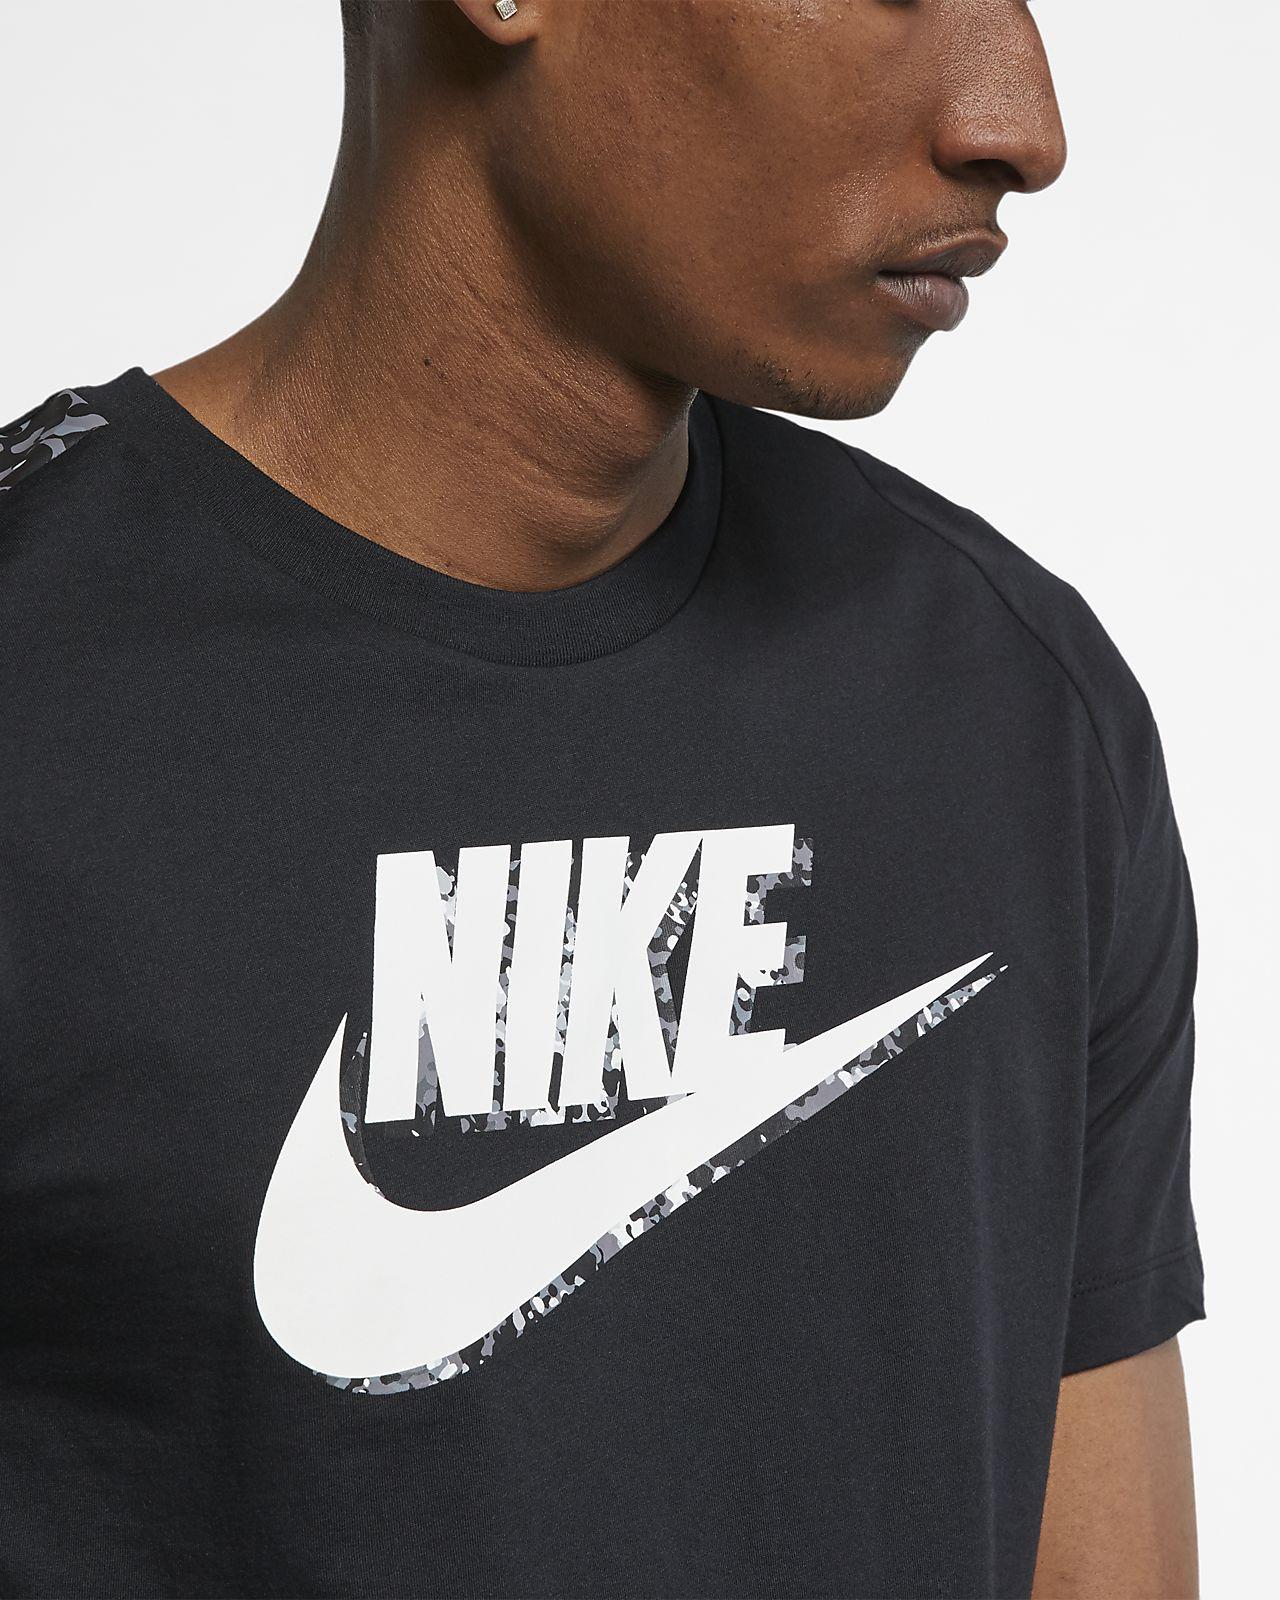 ee431a33fc3d82 Nike Sportswear Men's Camo T-Shirt. Nike.com ID